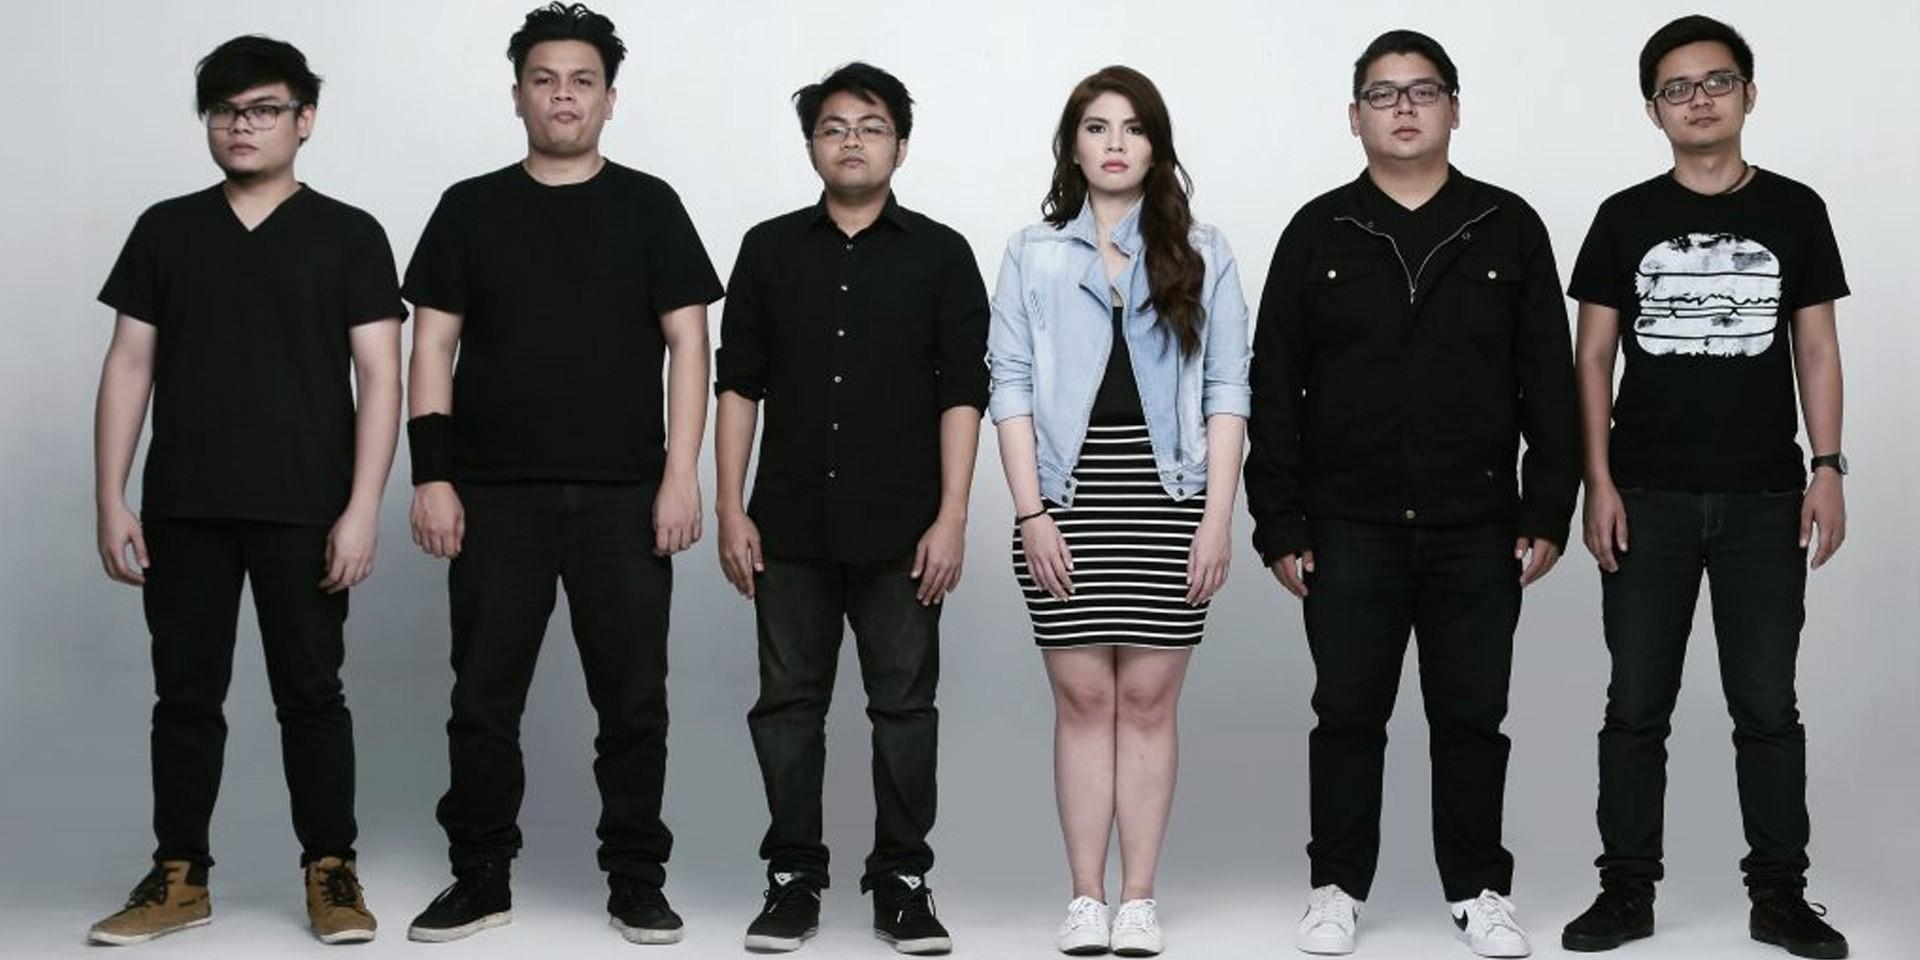 Autotelic surprise fans with new Takipsilim EP – listen